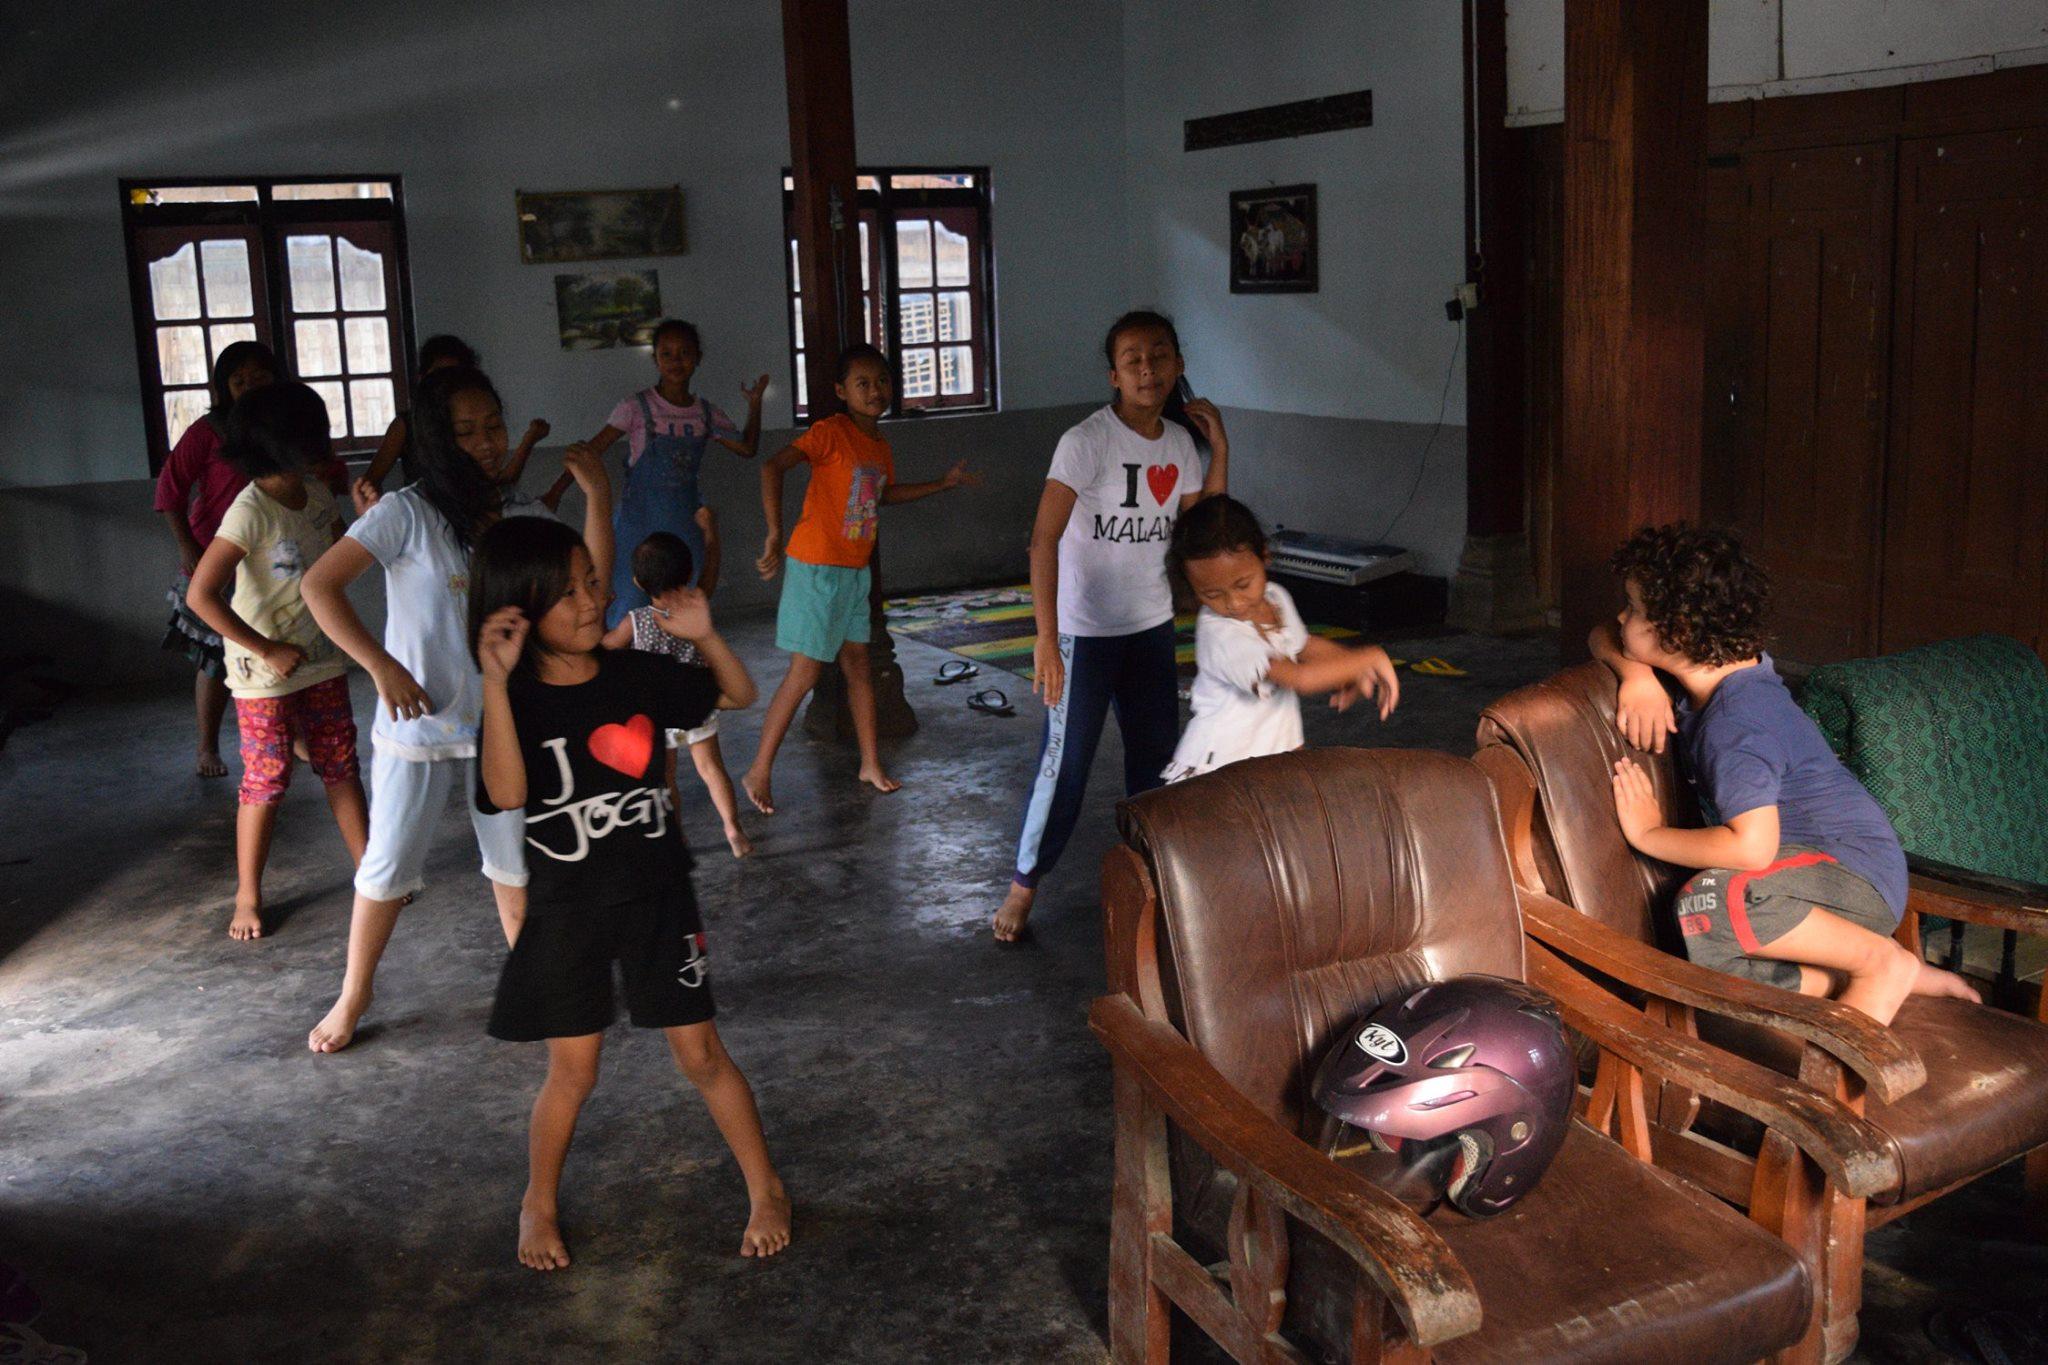 Latihan menari untuk tampil nanti malam / Rehearsal before an evening performance